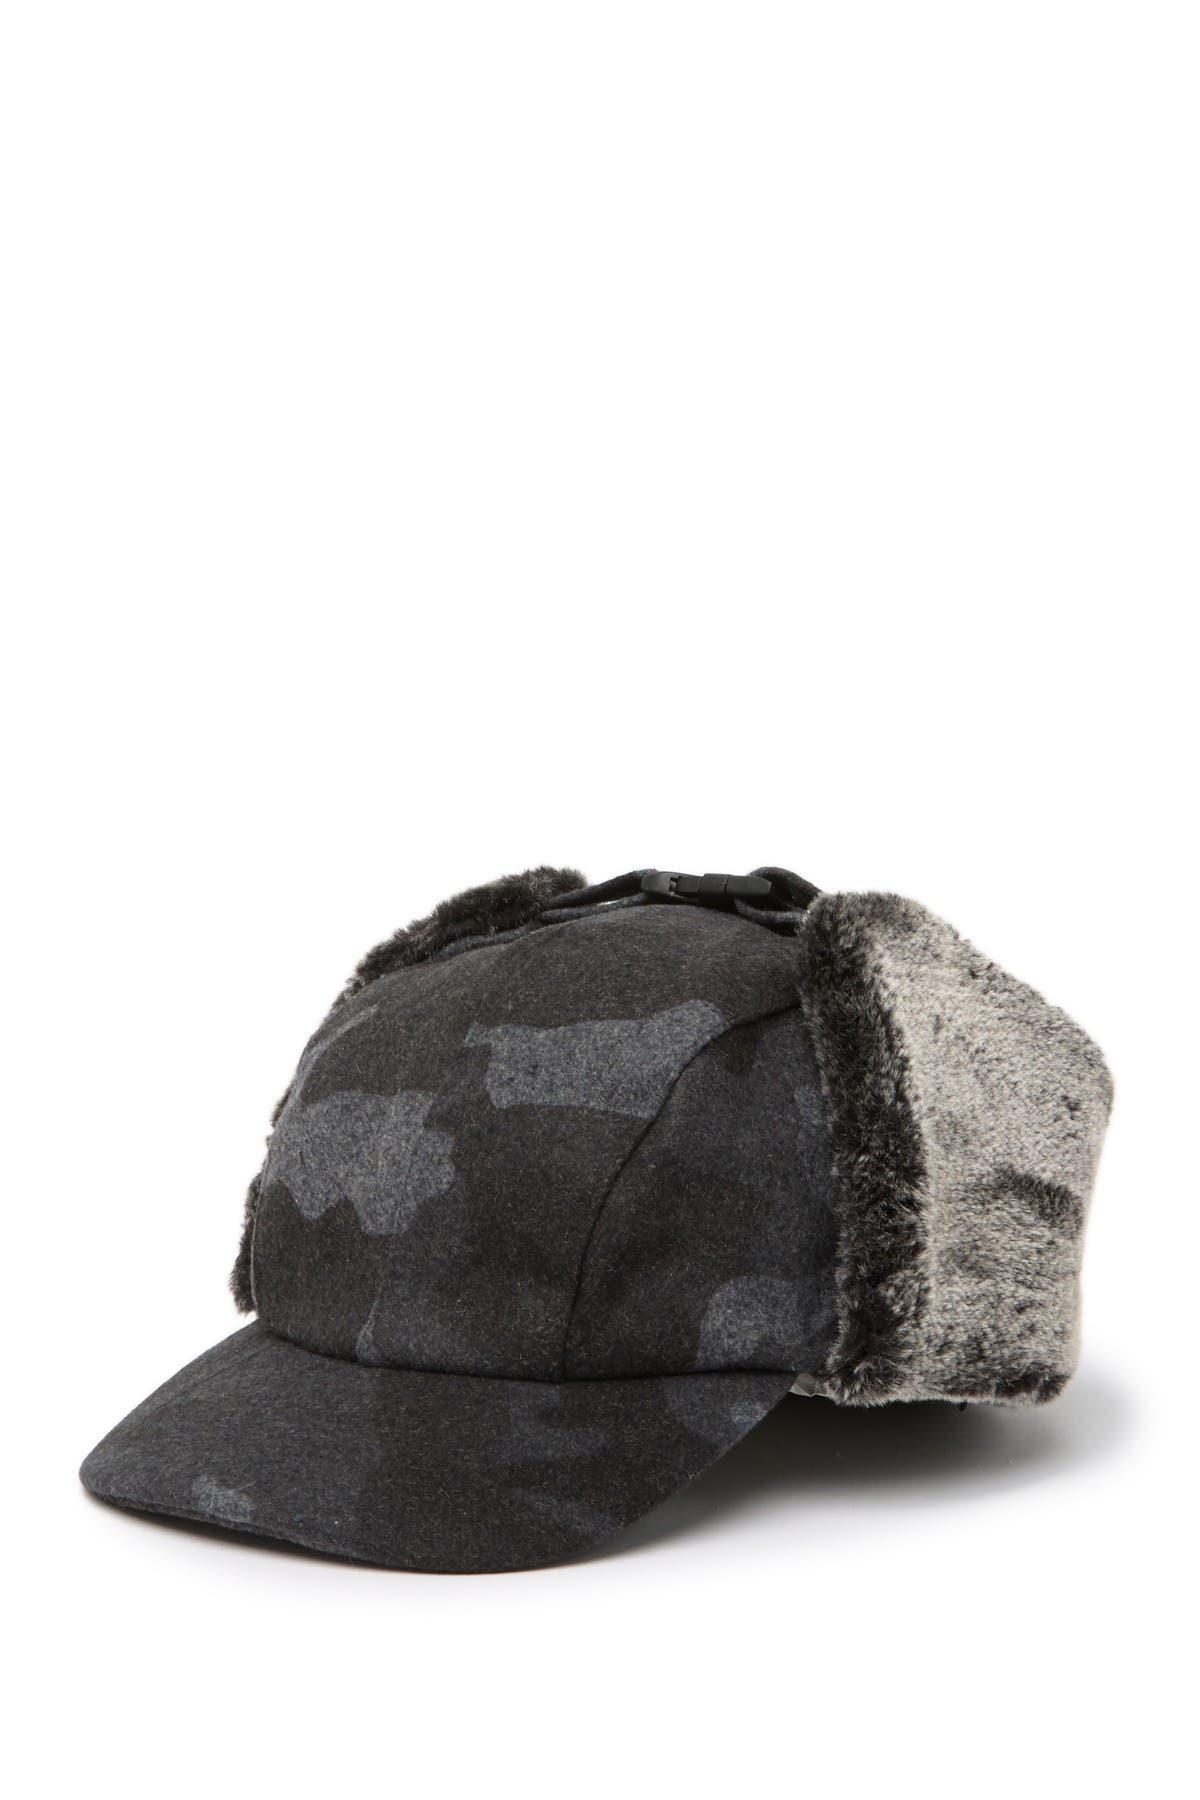 Image of Public Opinion Camo Faux Fur Detail Trapper Hat